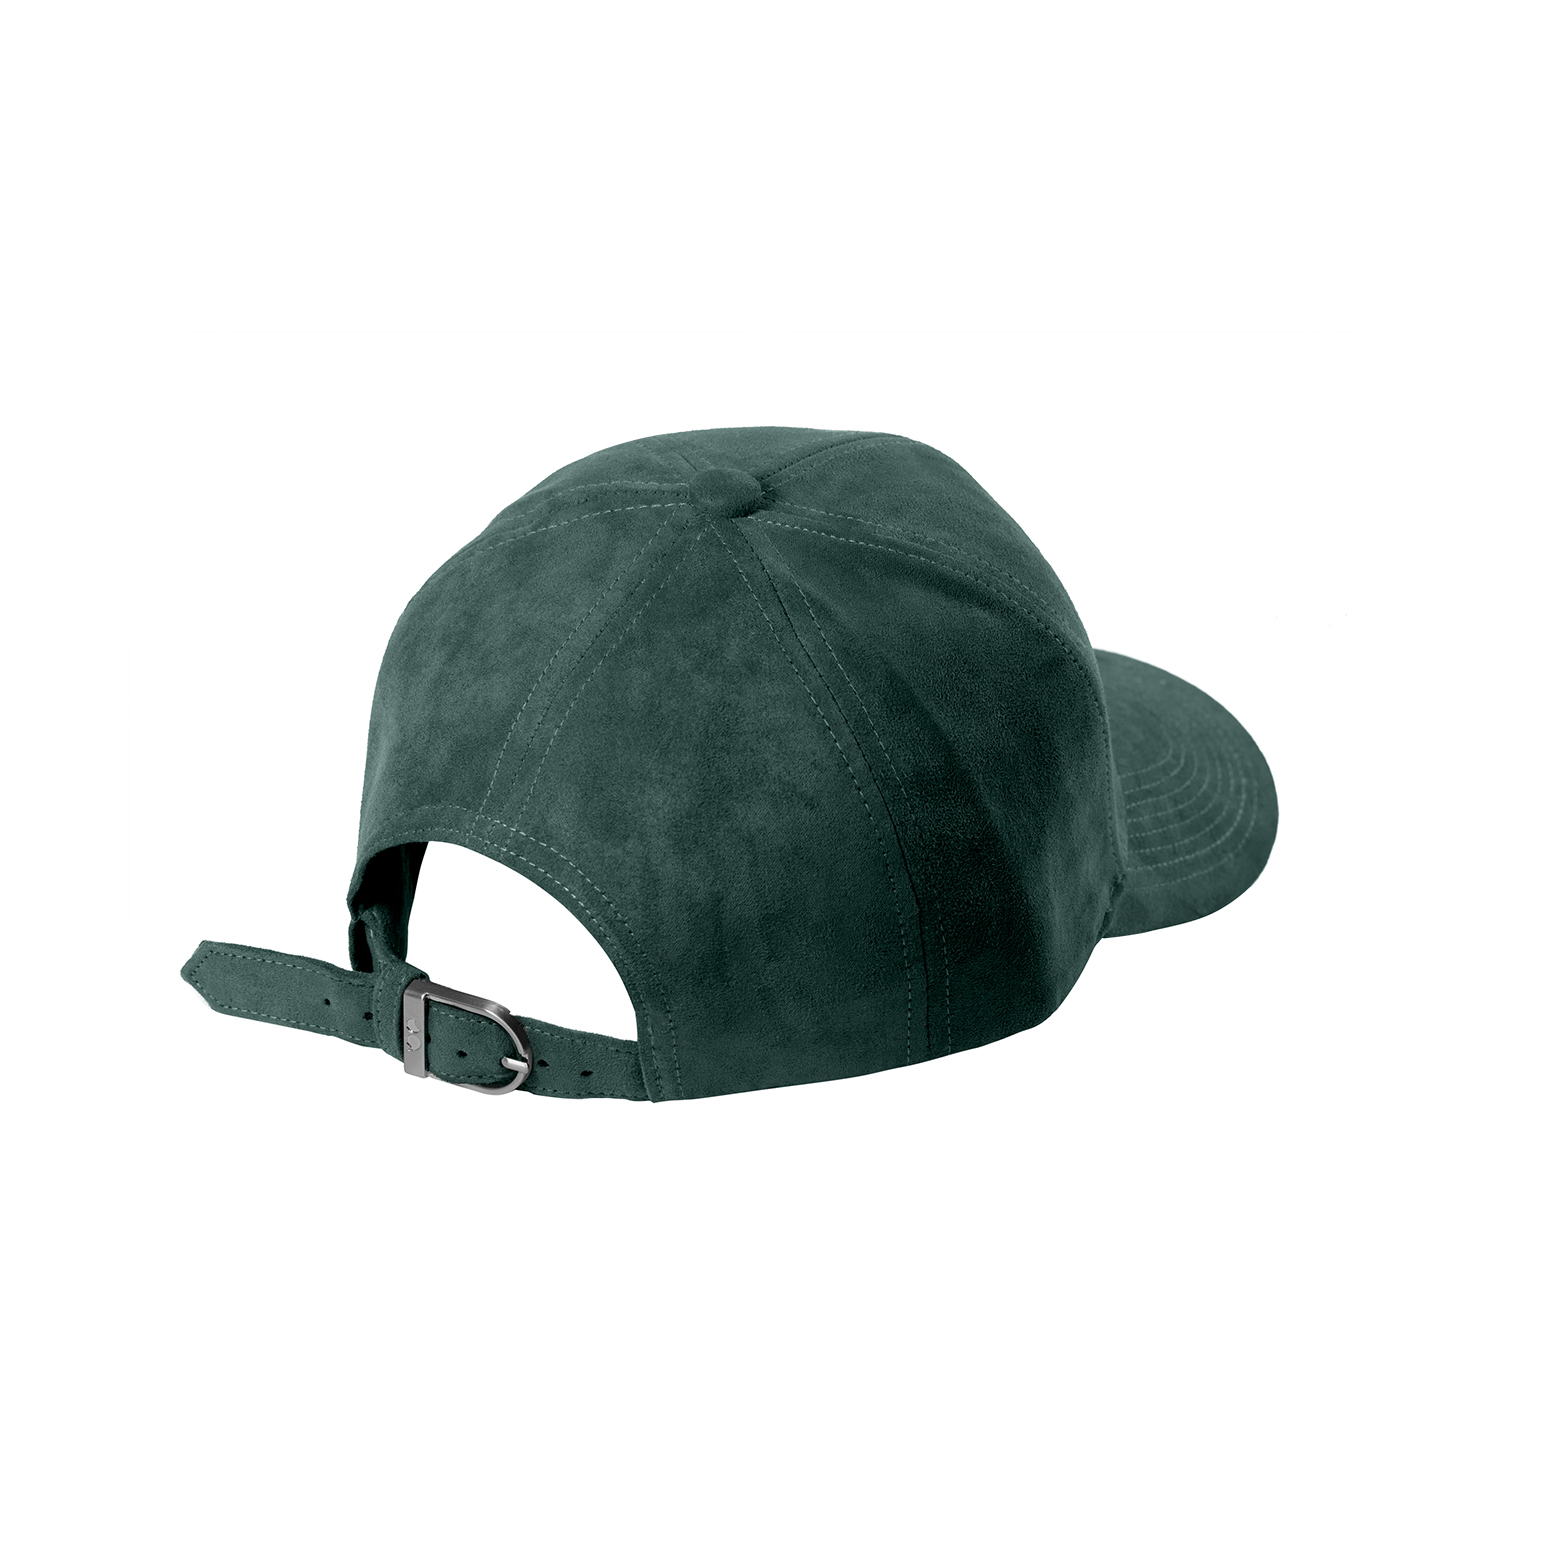 BASEBALL CAP PETROL GREEN SUEDE SILVER BACK SIDE